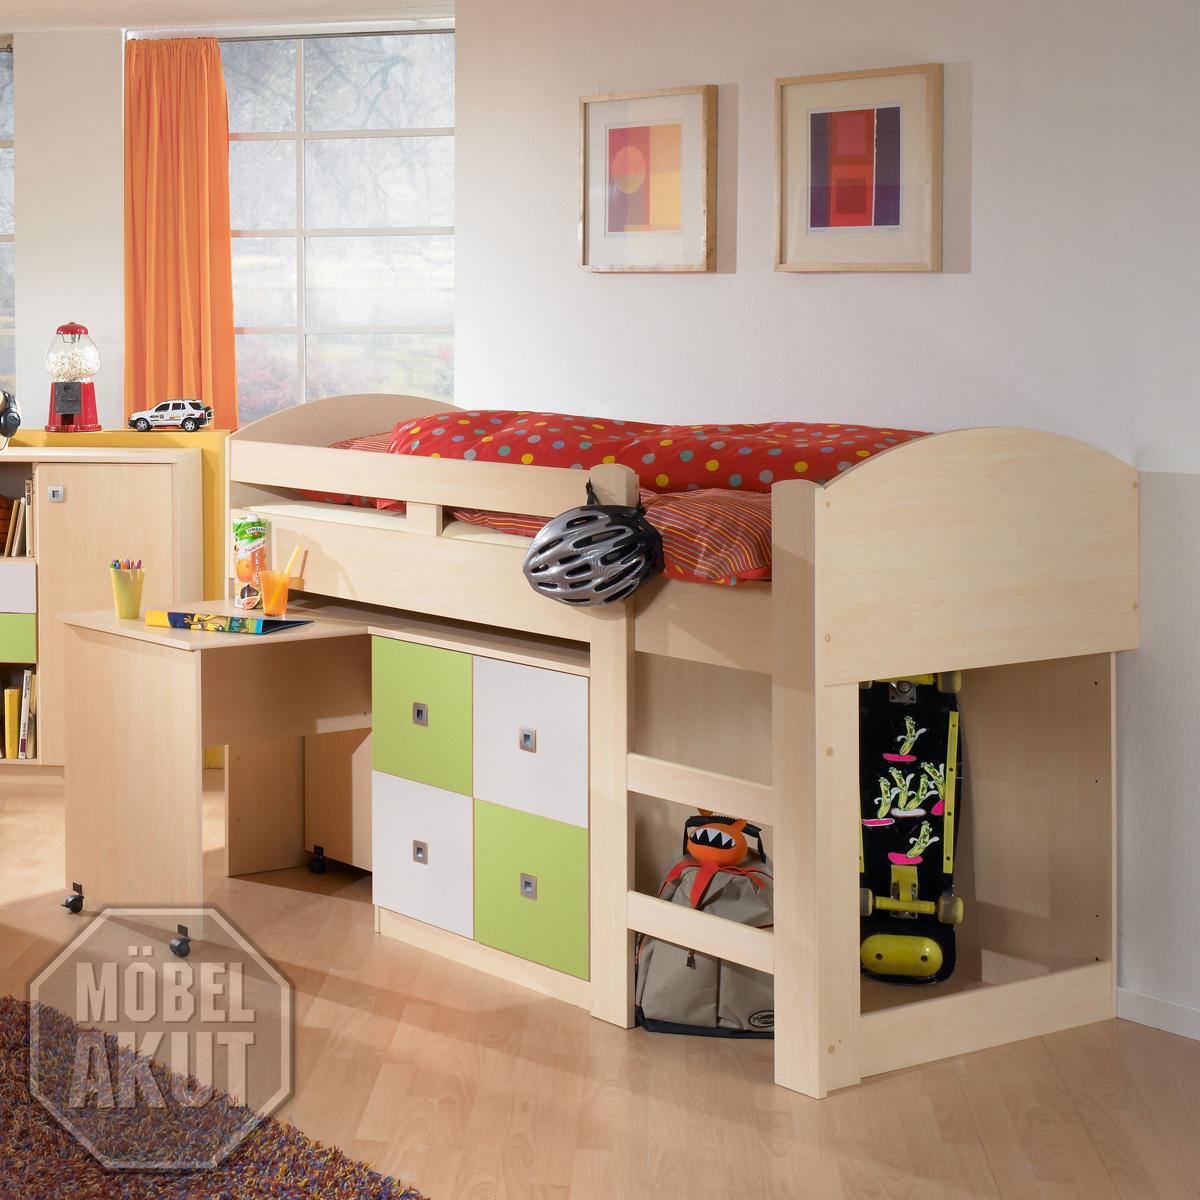 hochbett sando bett in ahorn gr n wei 90x200 ebay. Black Bedroom Furniture Sets. Home Design Ideas